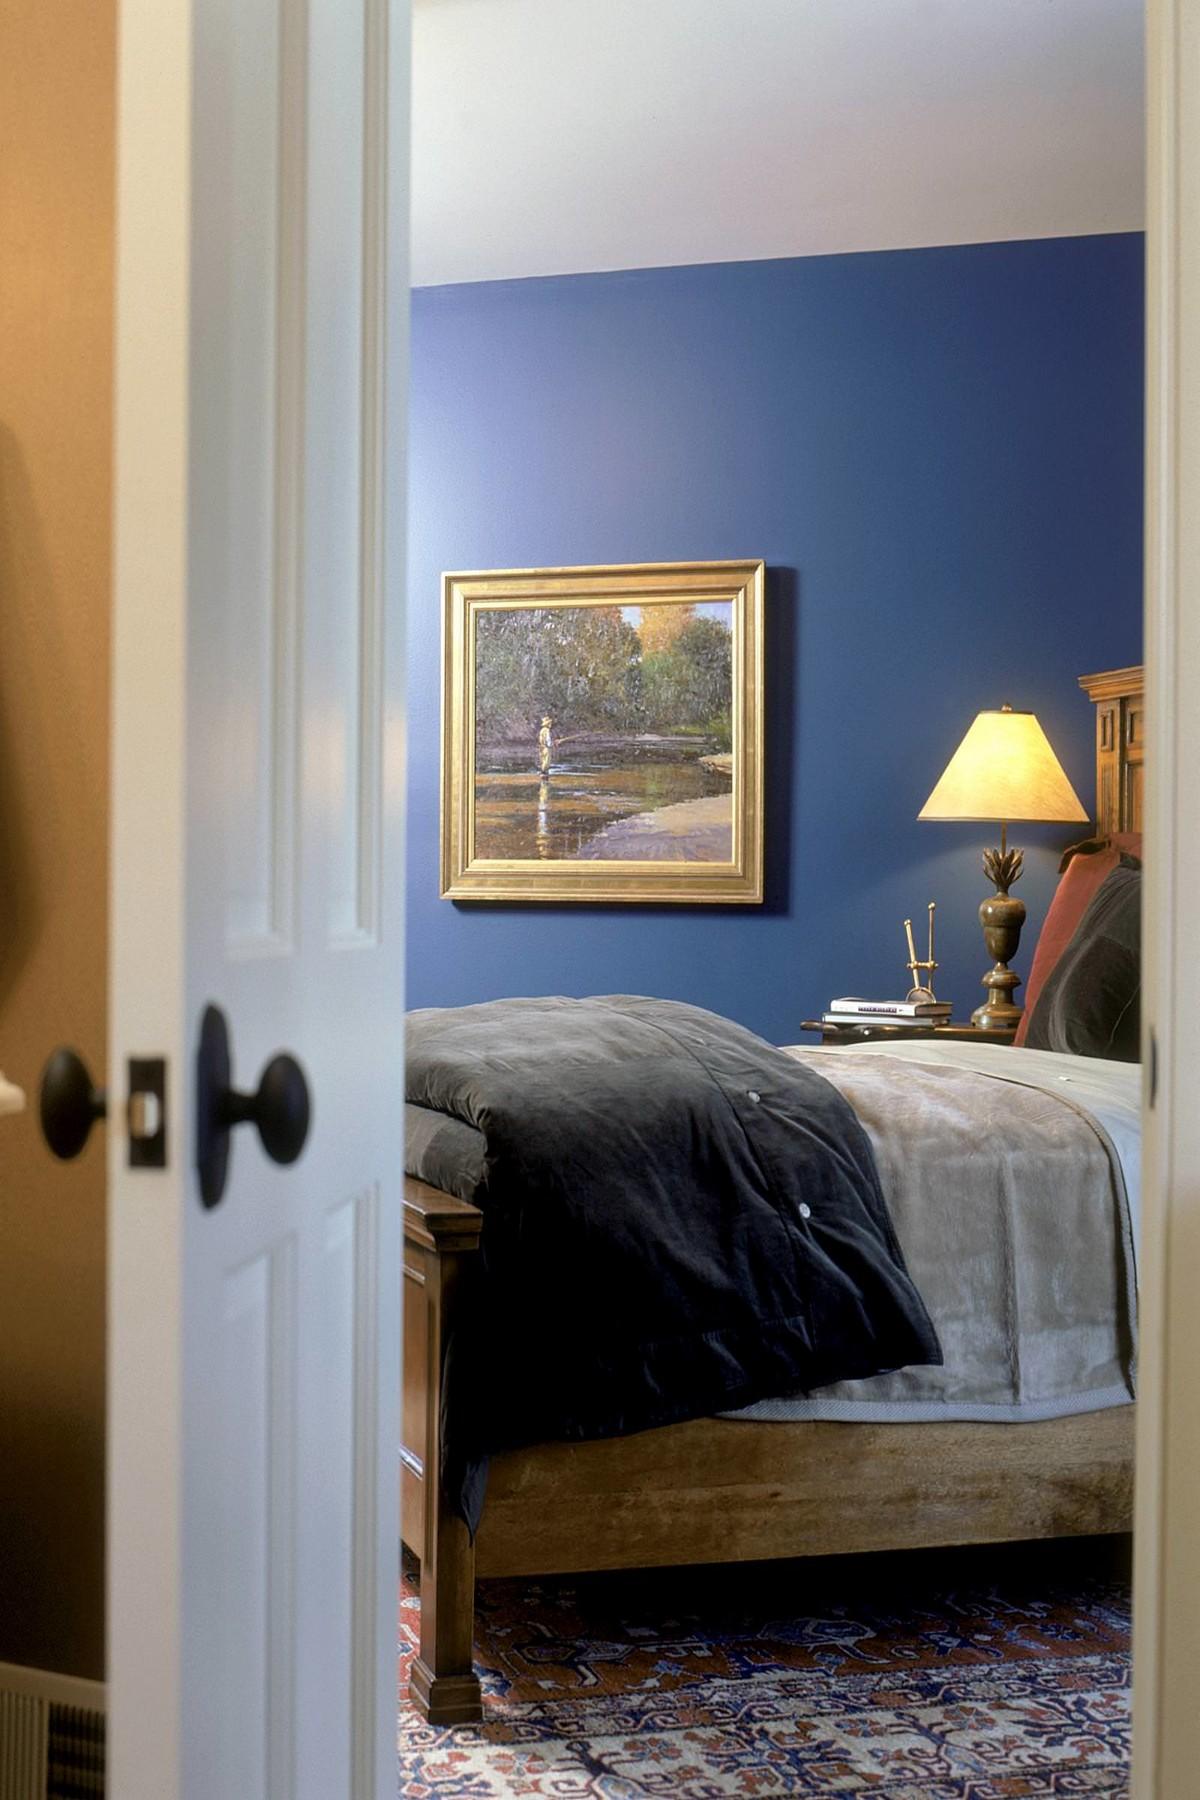 Additional photo for property listing at Custom Saratoga Springs Home 000  Woodard Rd Wilton, Nueva York 12831 Estados Unidos